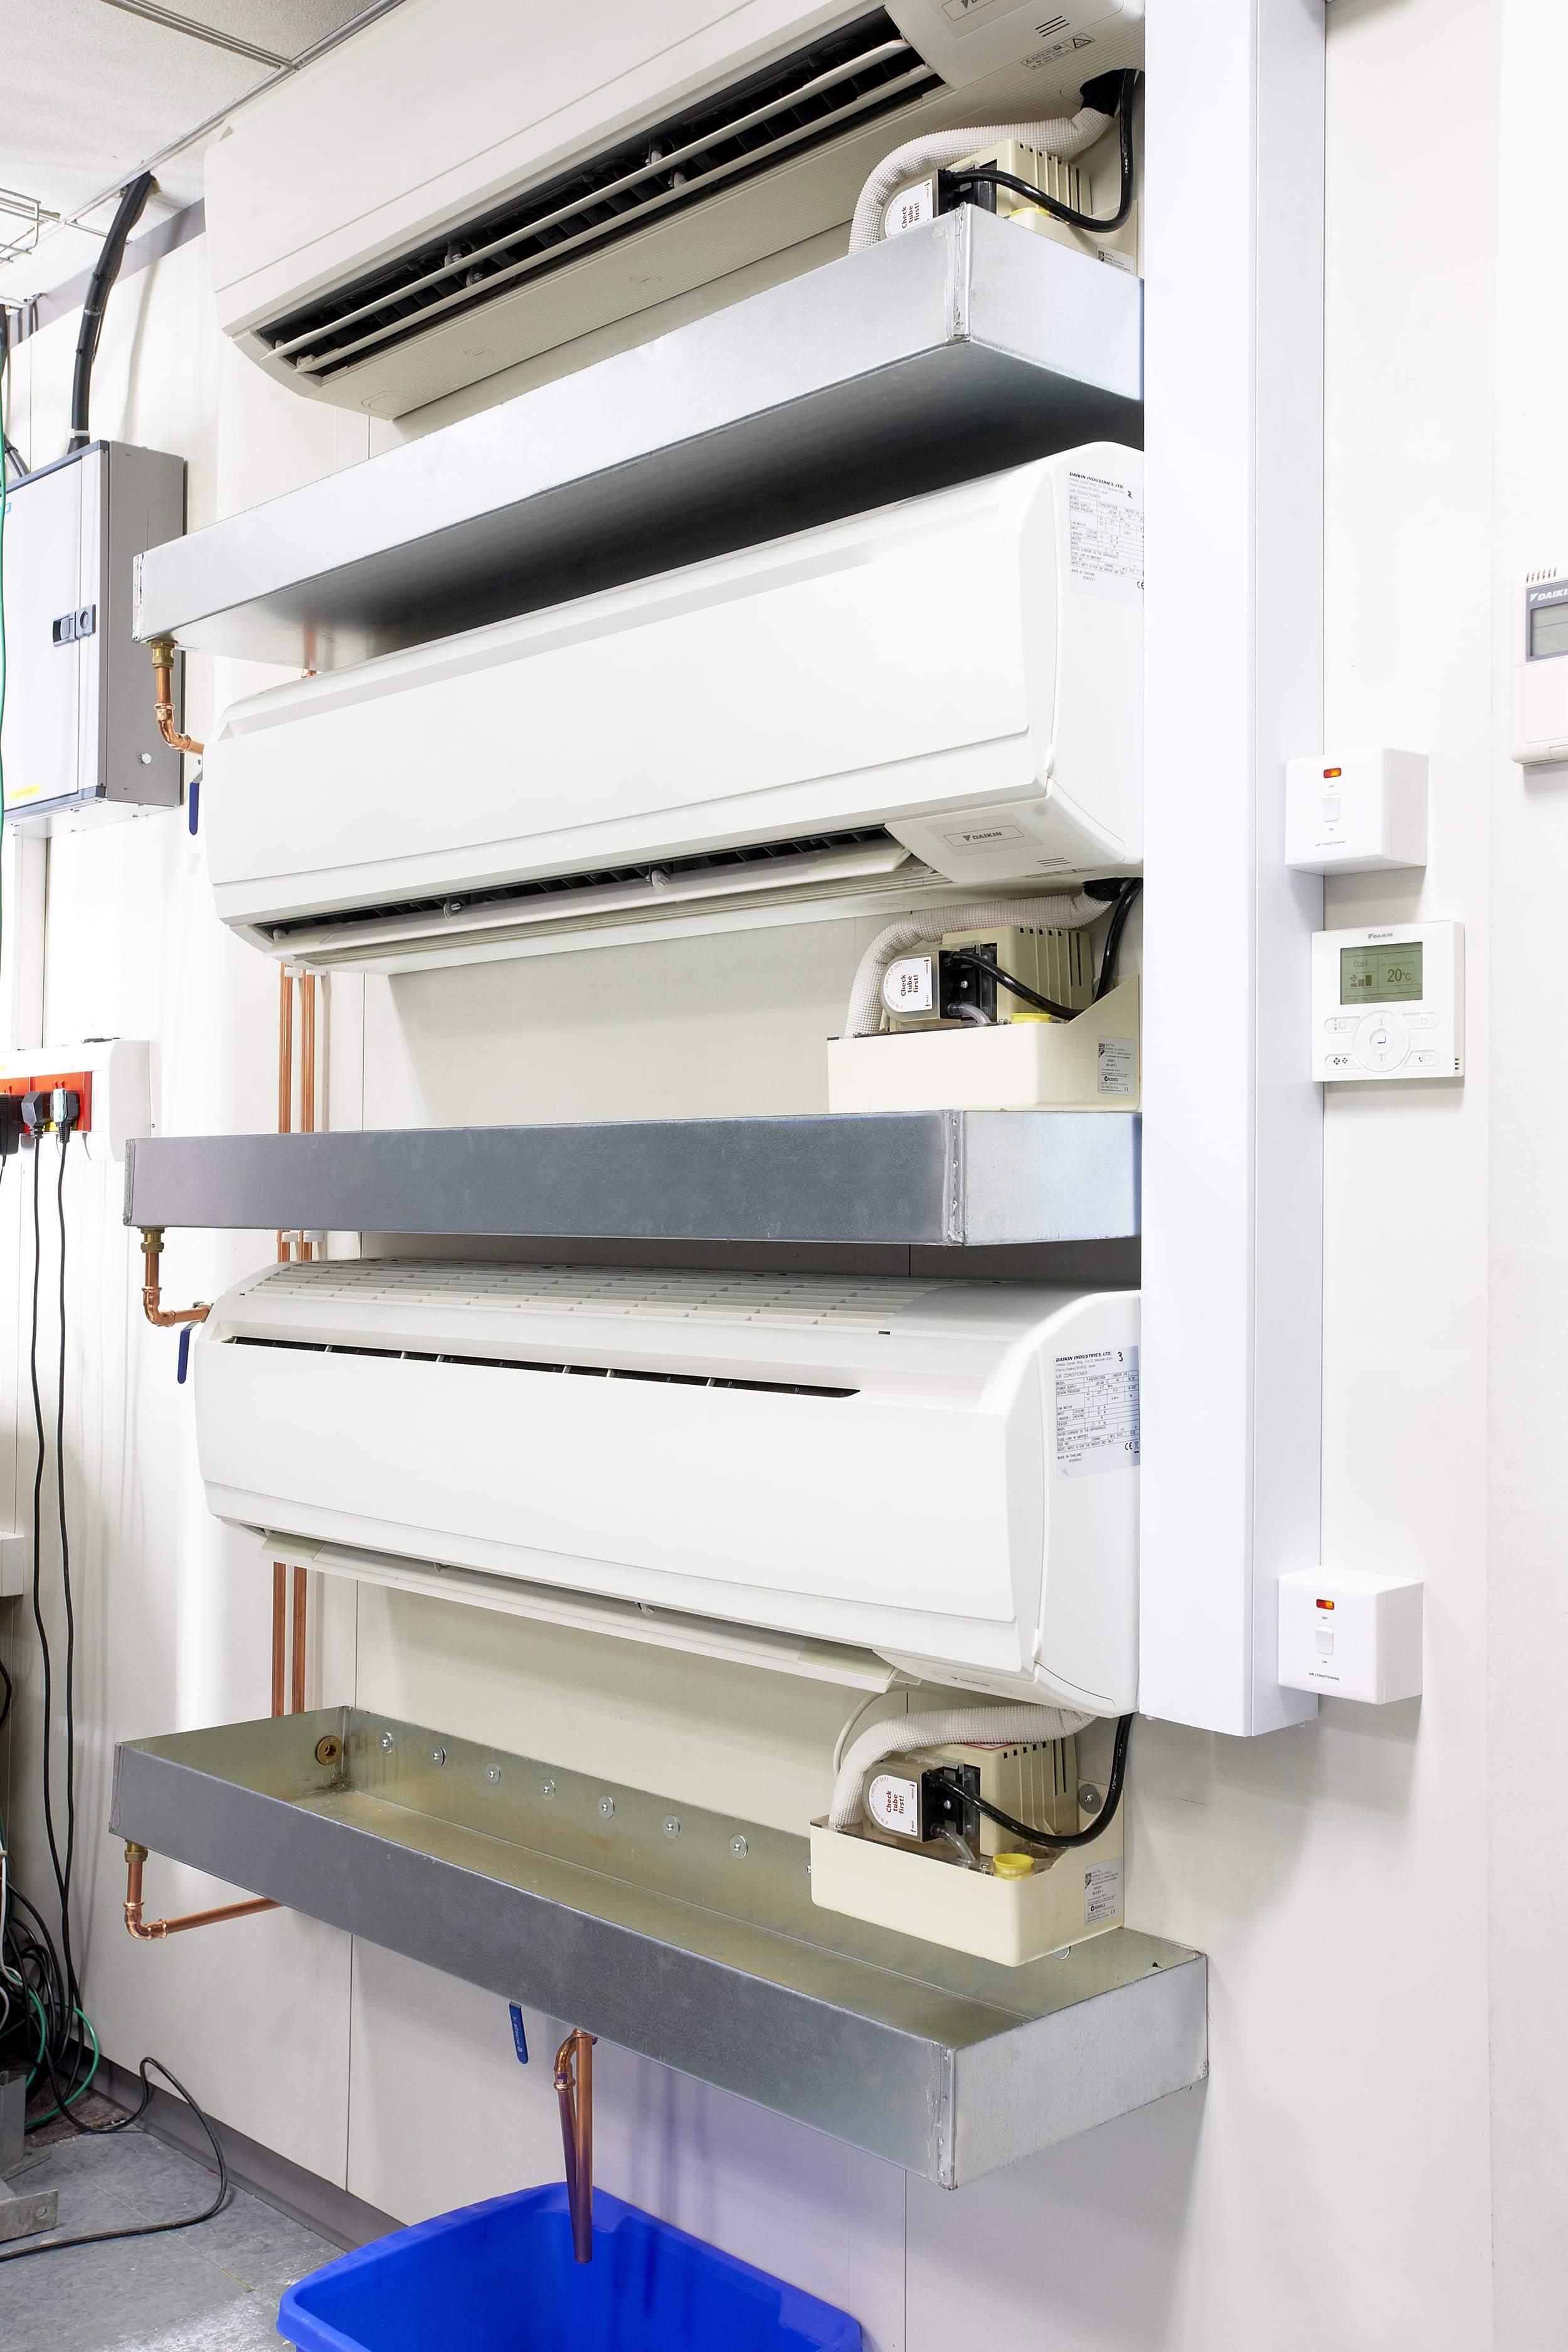 Anritsu-361-Degrees-Air-Conditioning-Case-Study-14.jpg